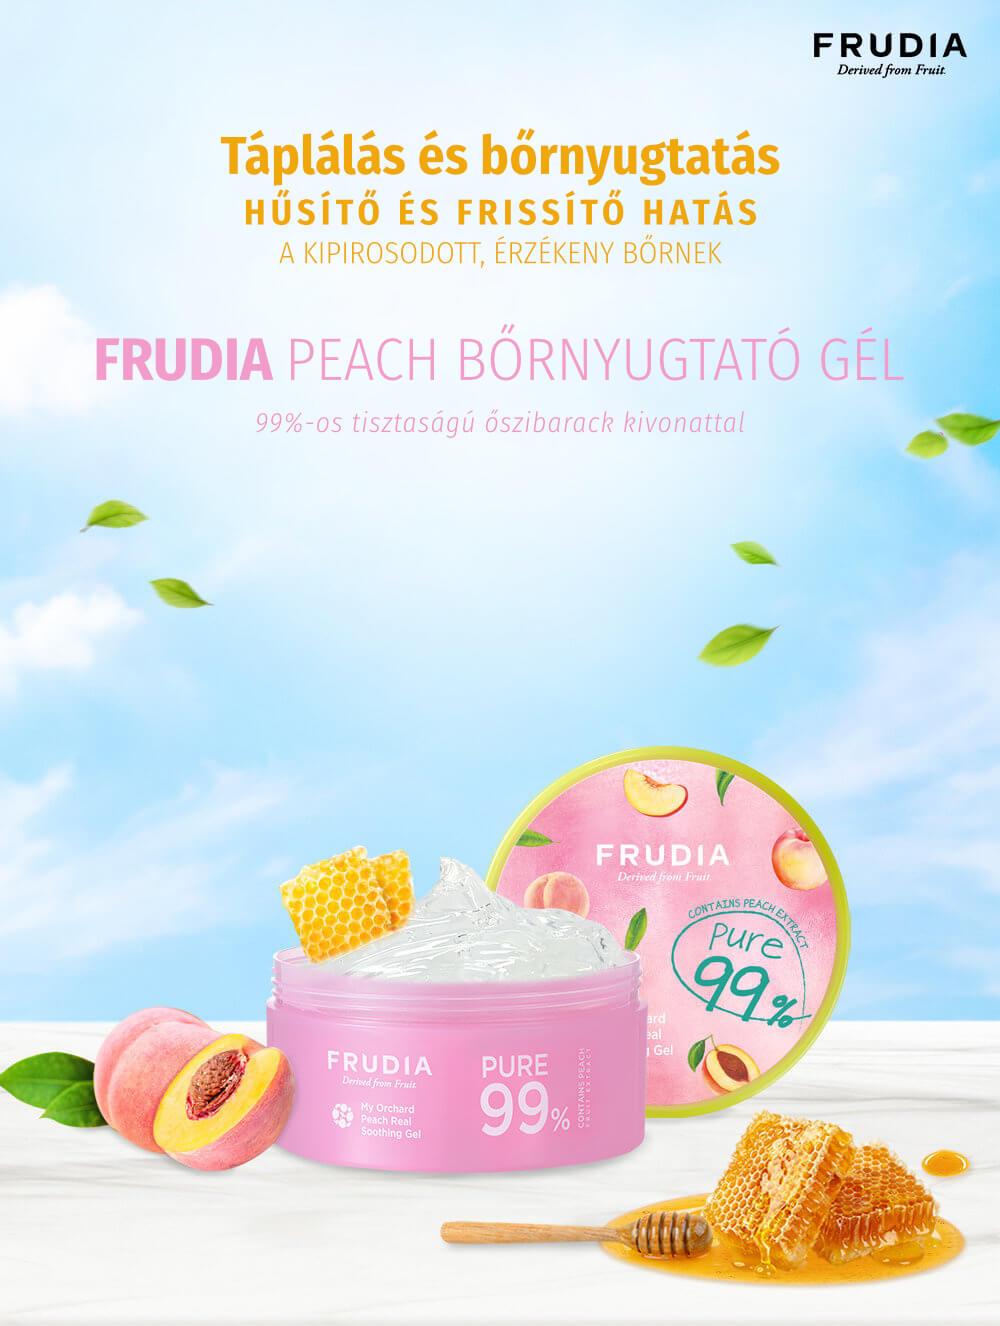 Frudia-peach-bornyugtato-gel-des